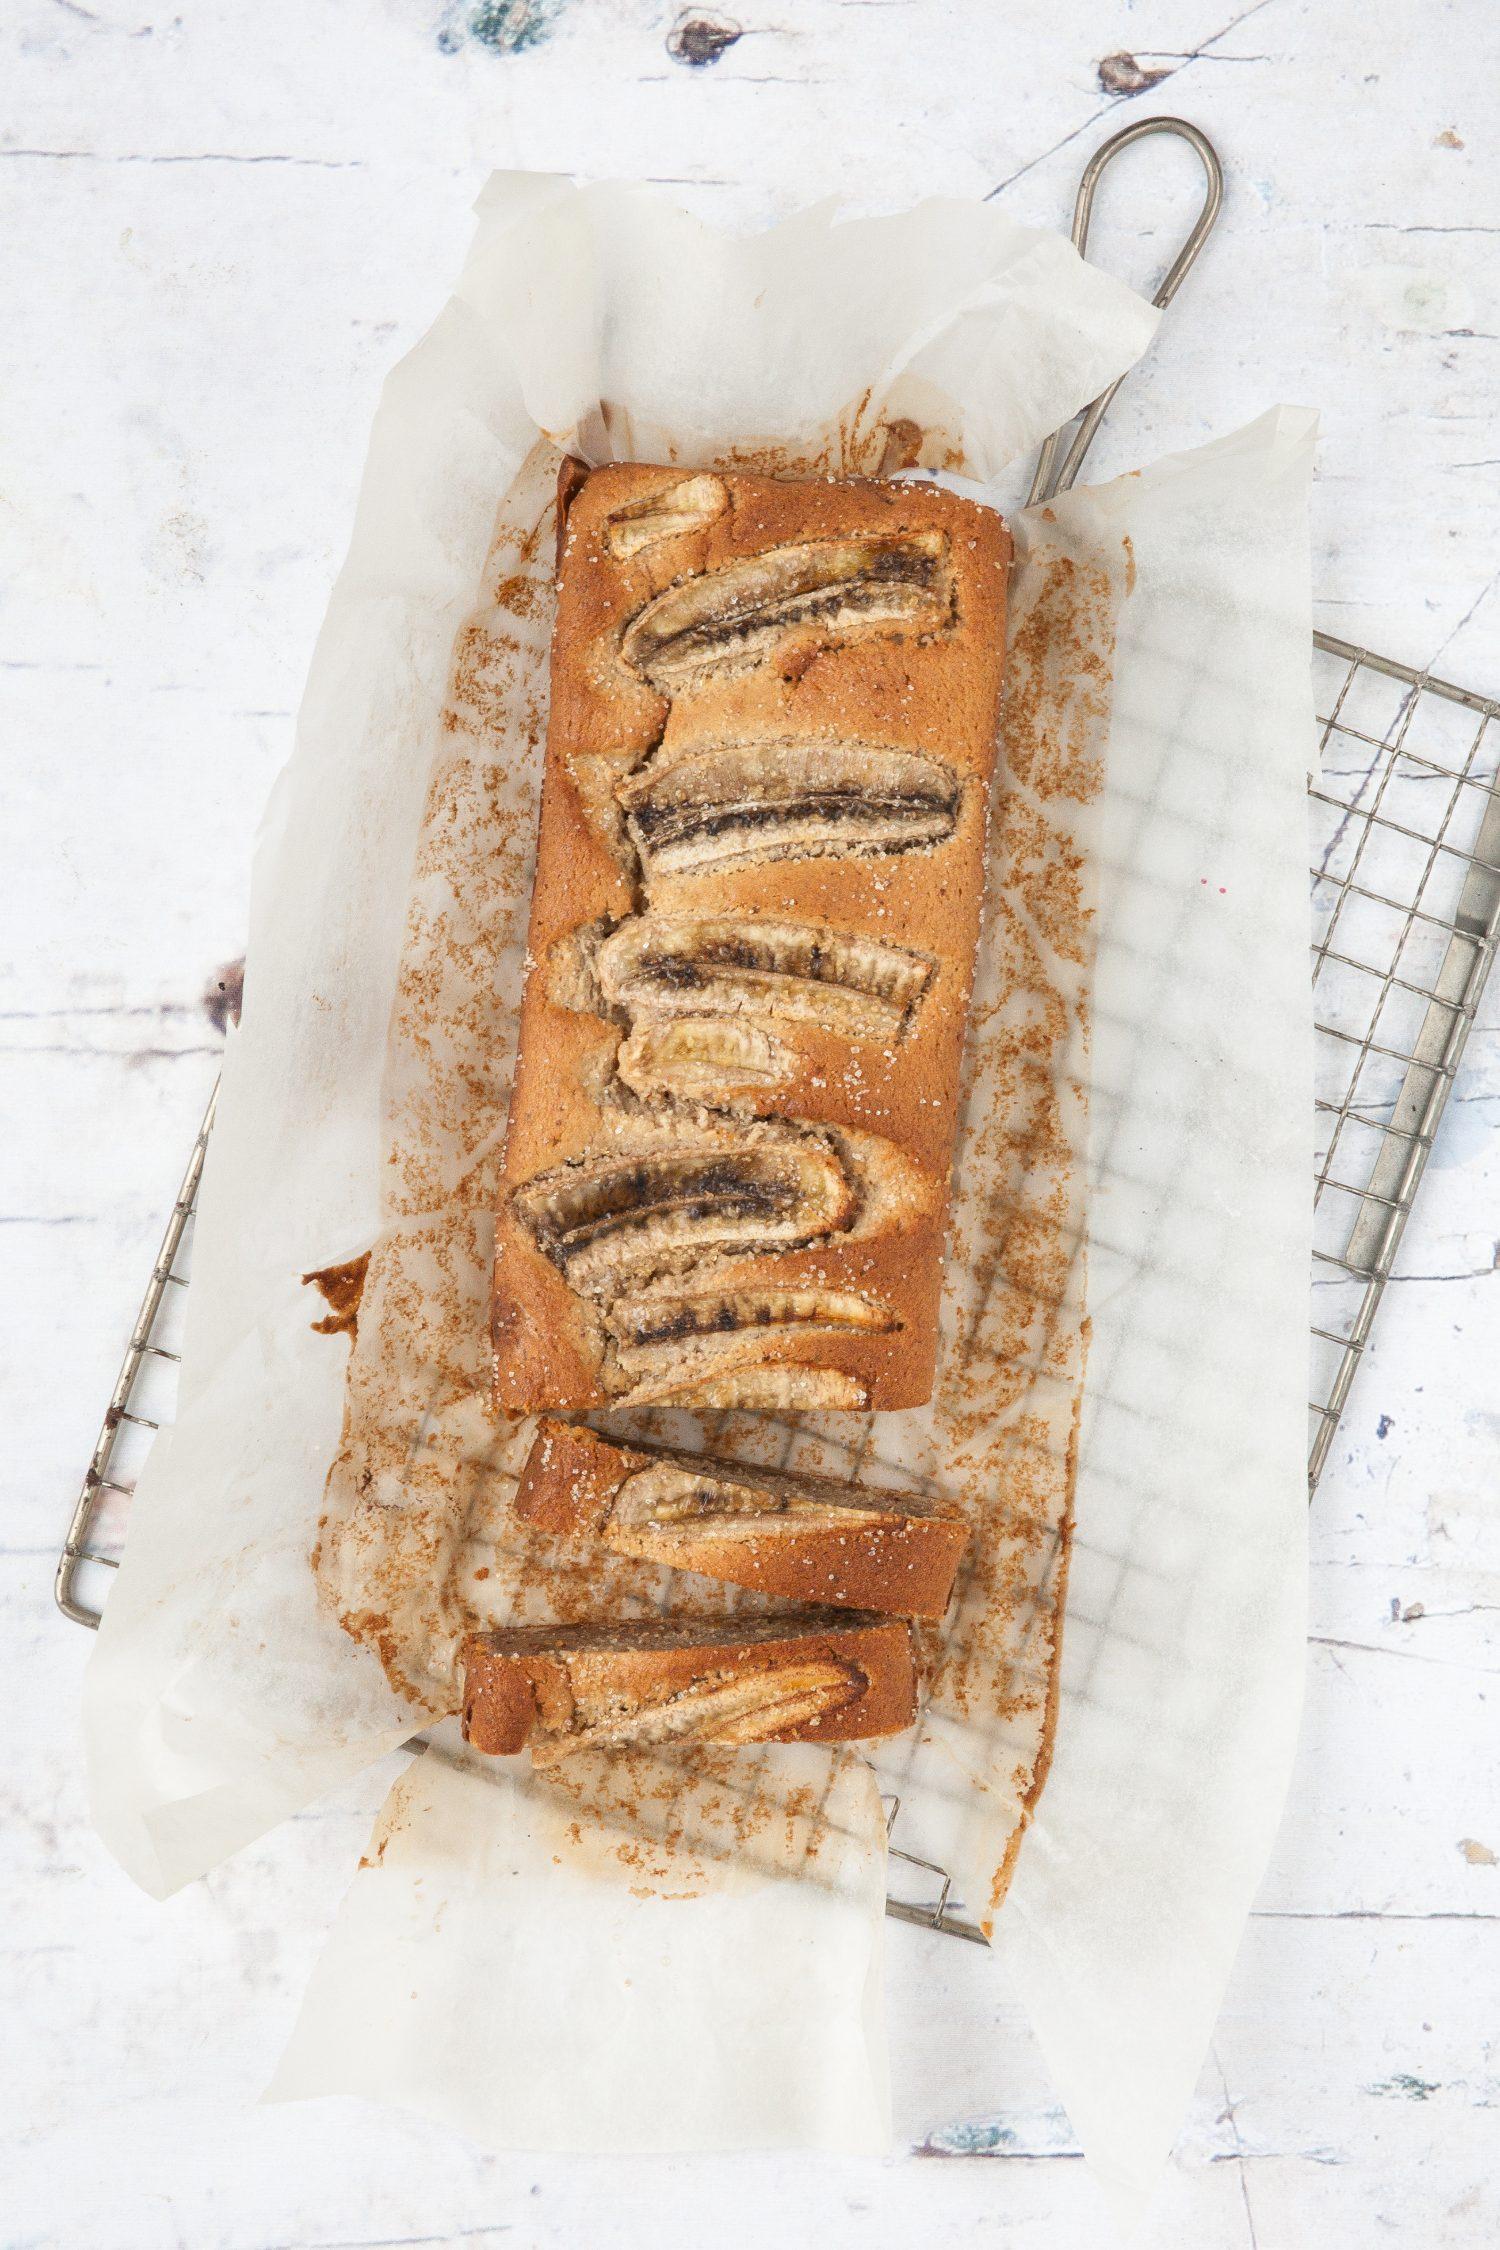 Carpe Diem with Banana Bread